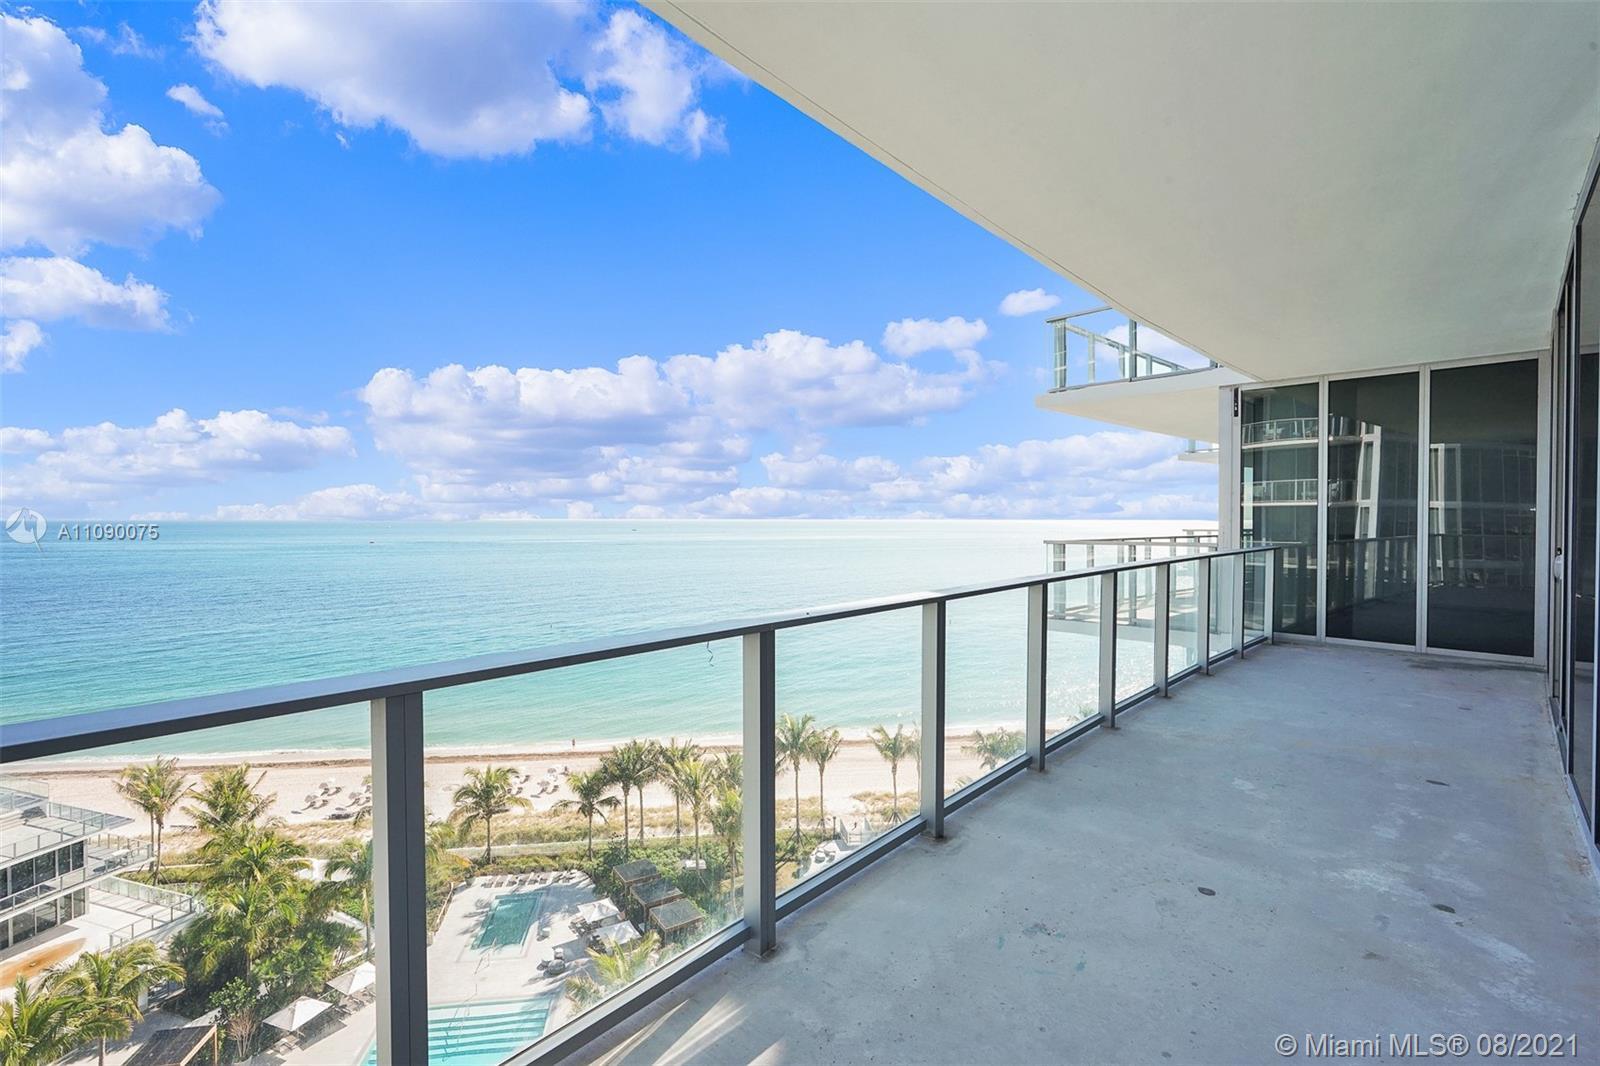 2200 N Ocean Blvd, Unit #S1005 Luxury Real Estate